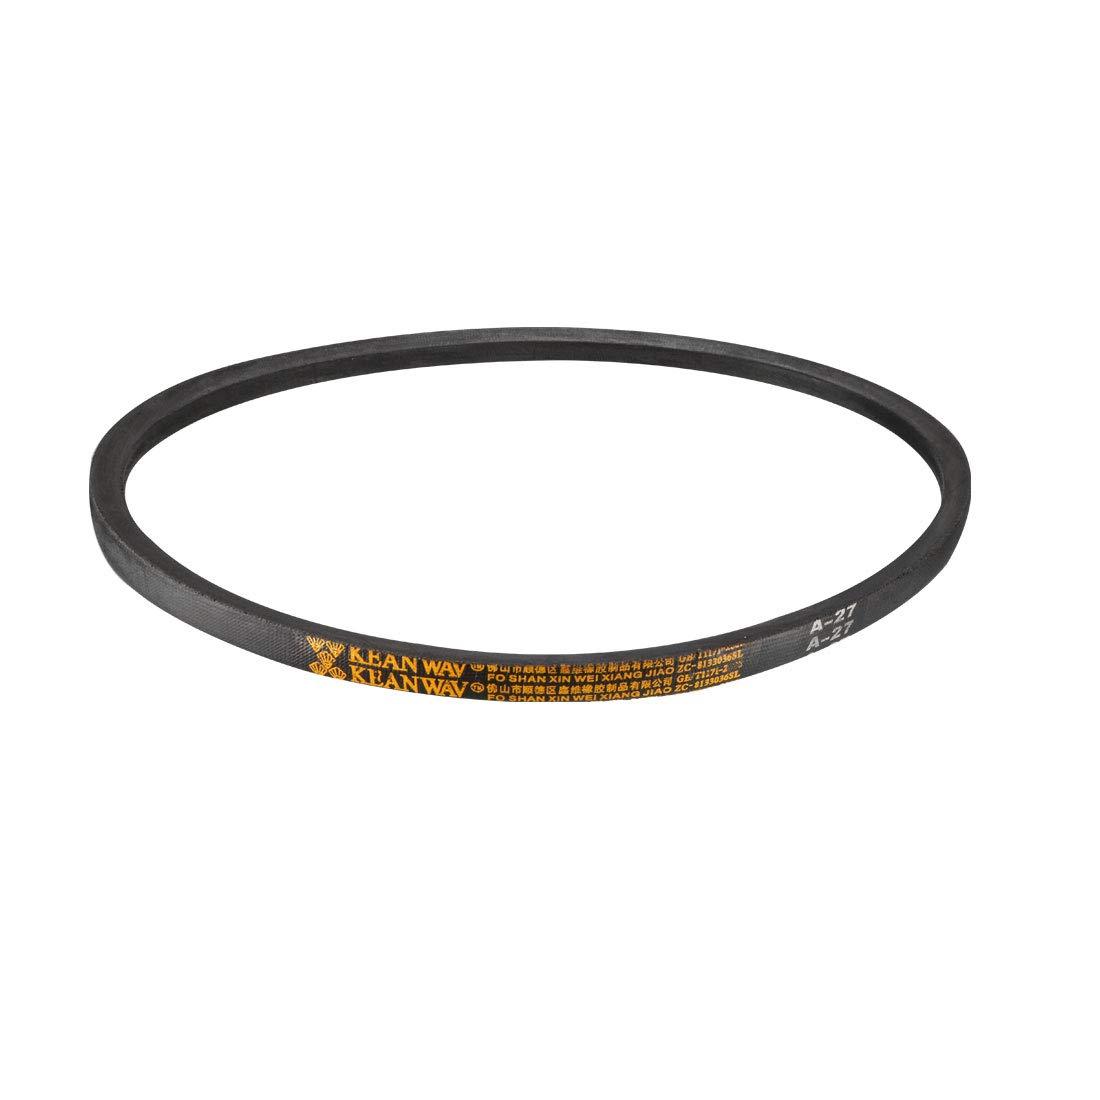 uxcell A-25 Drive V-Belt Girth 25-inch Industrial Power Rubber Transmission Belt